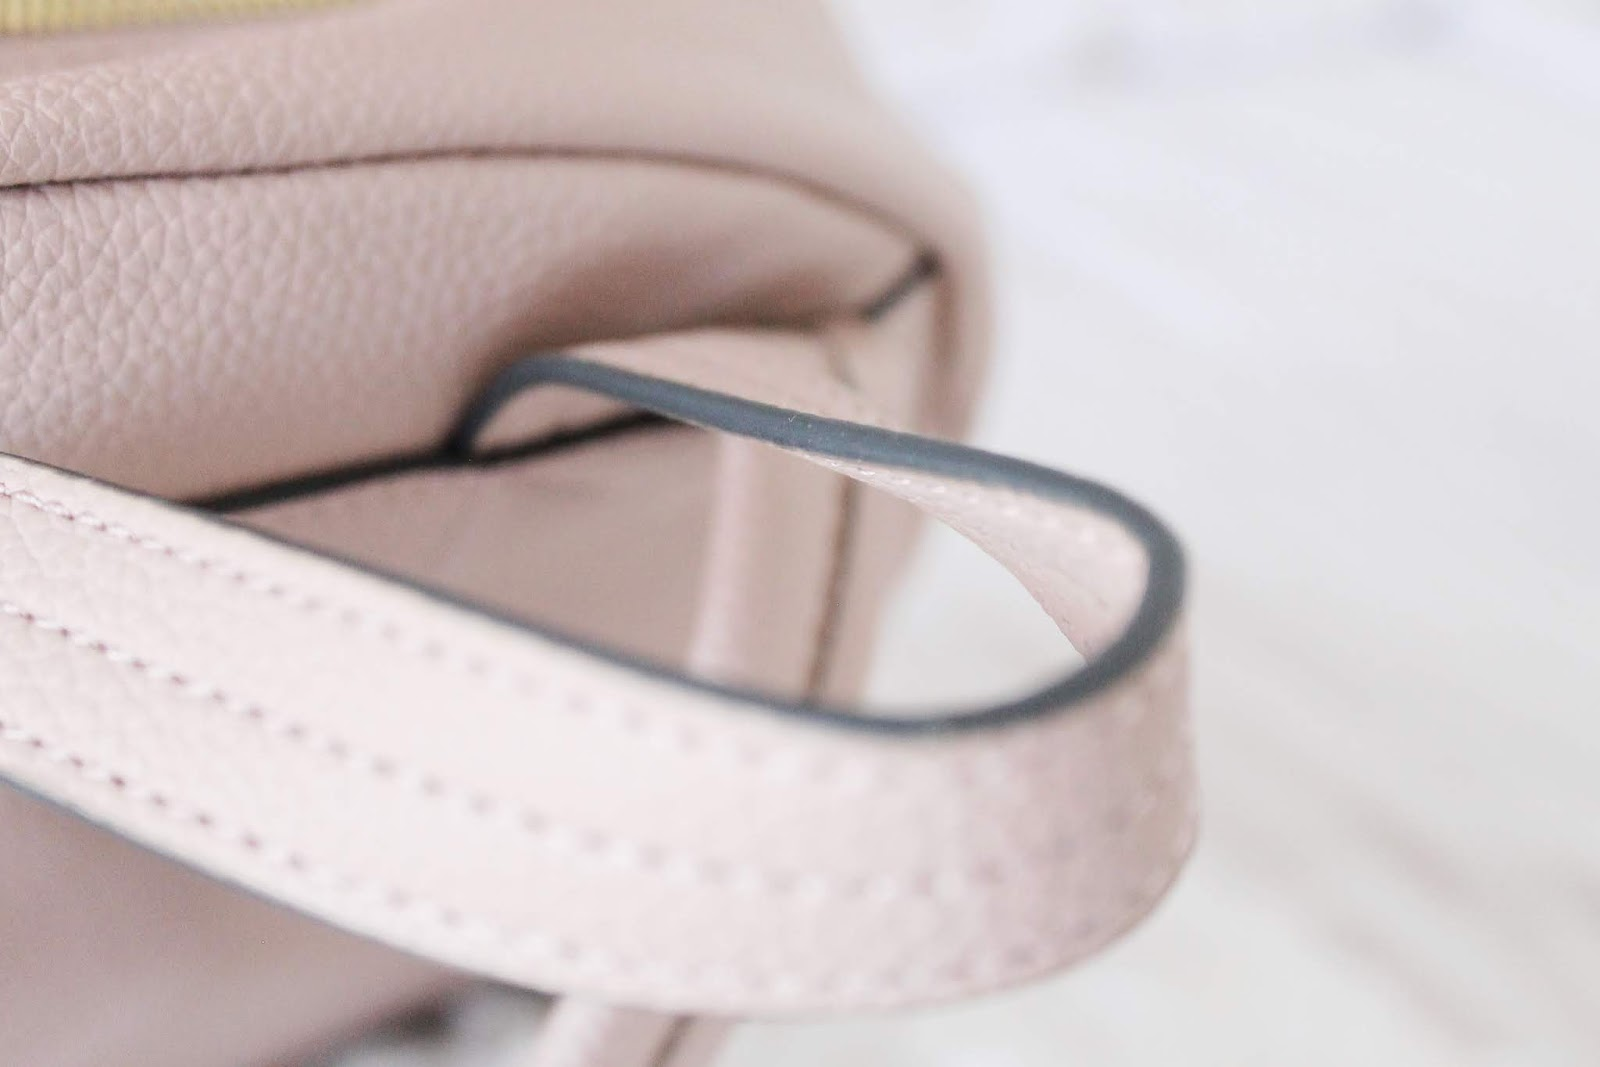 Girly shopping haul beauty style fashion blog